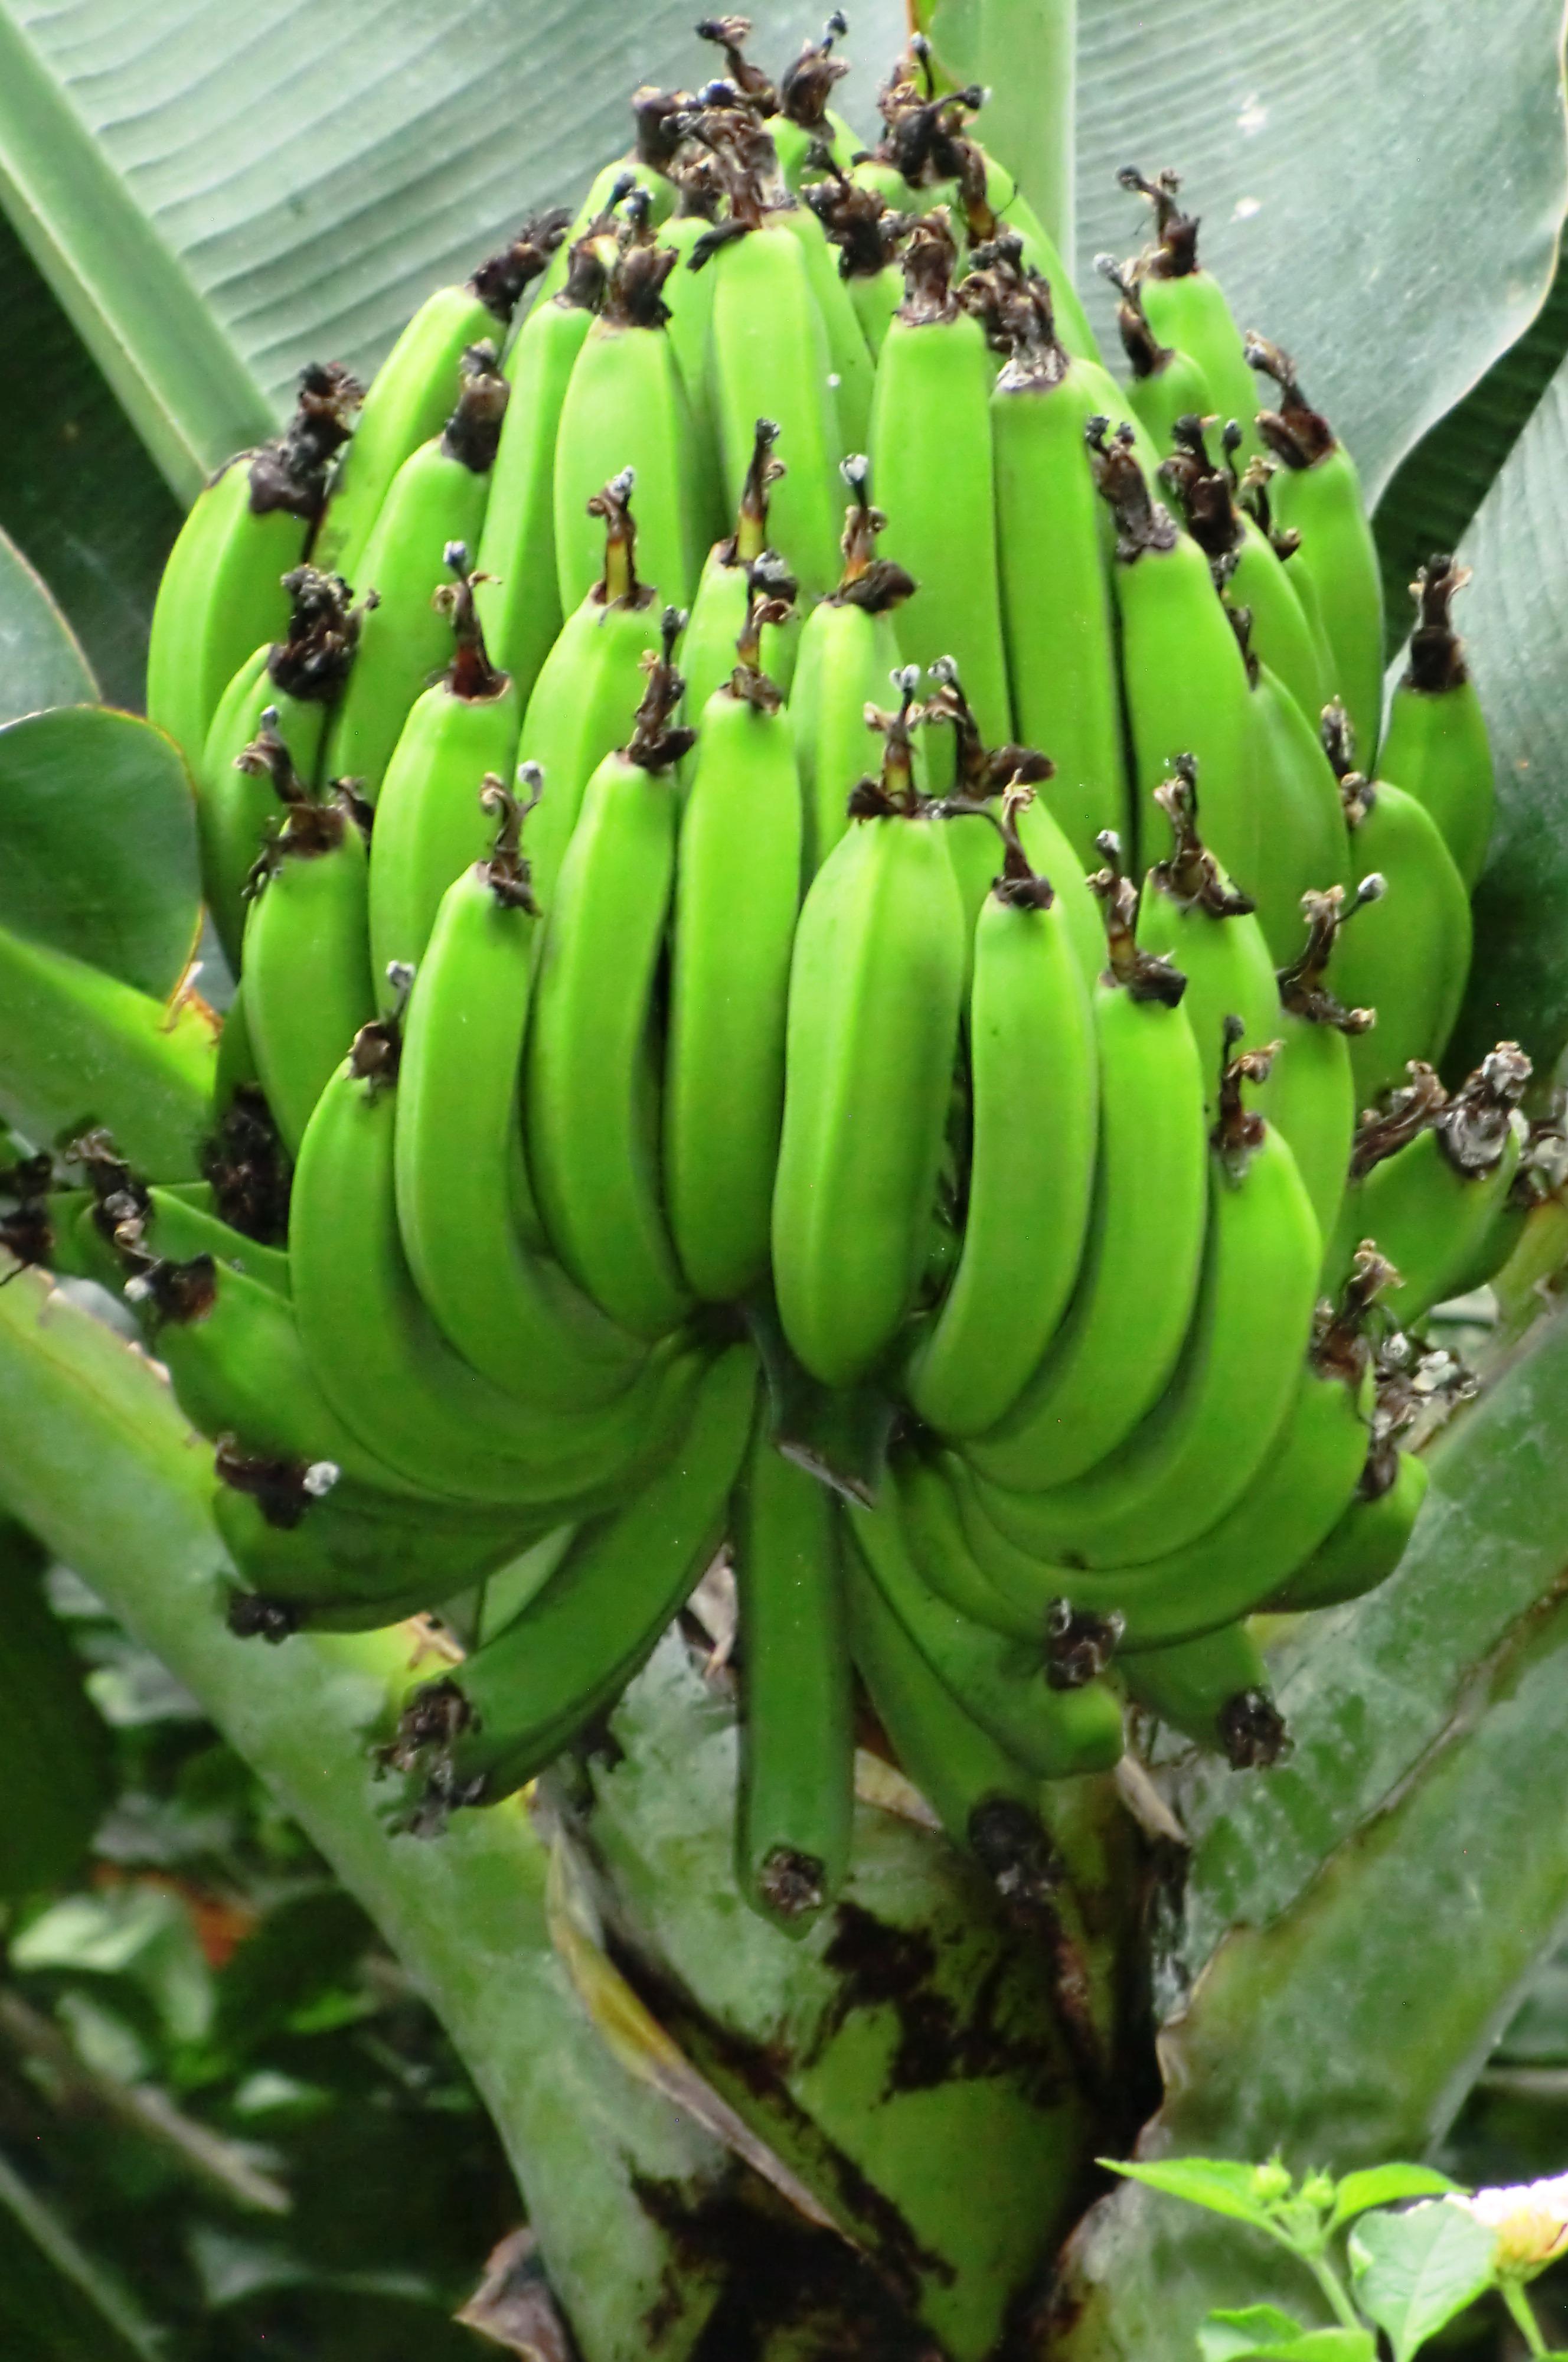 Free Images Banana Tree Banana Leaf Fruit Ripening Food